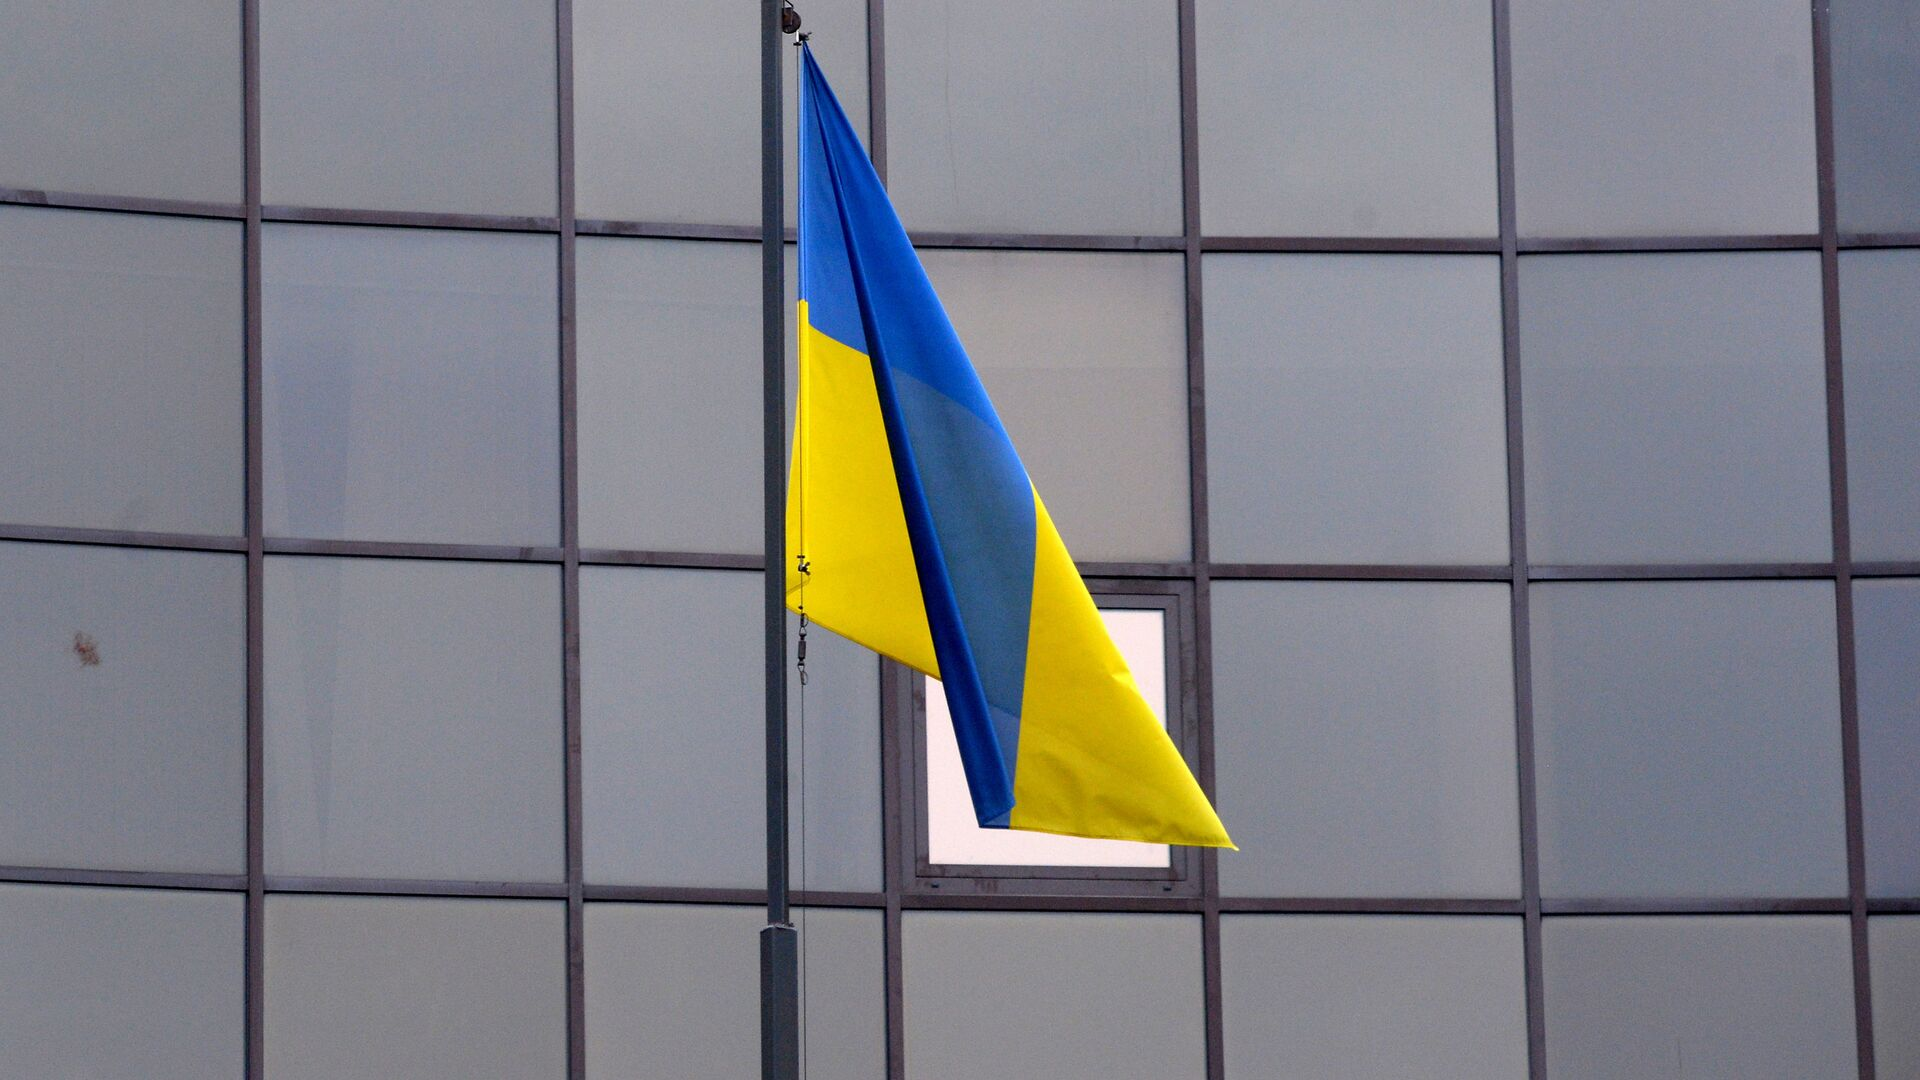 La bandera de Ucrania - Sputnik Mundo, 1920, 22.03.2021